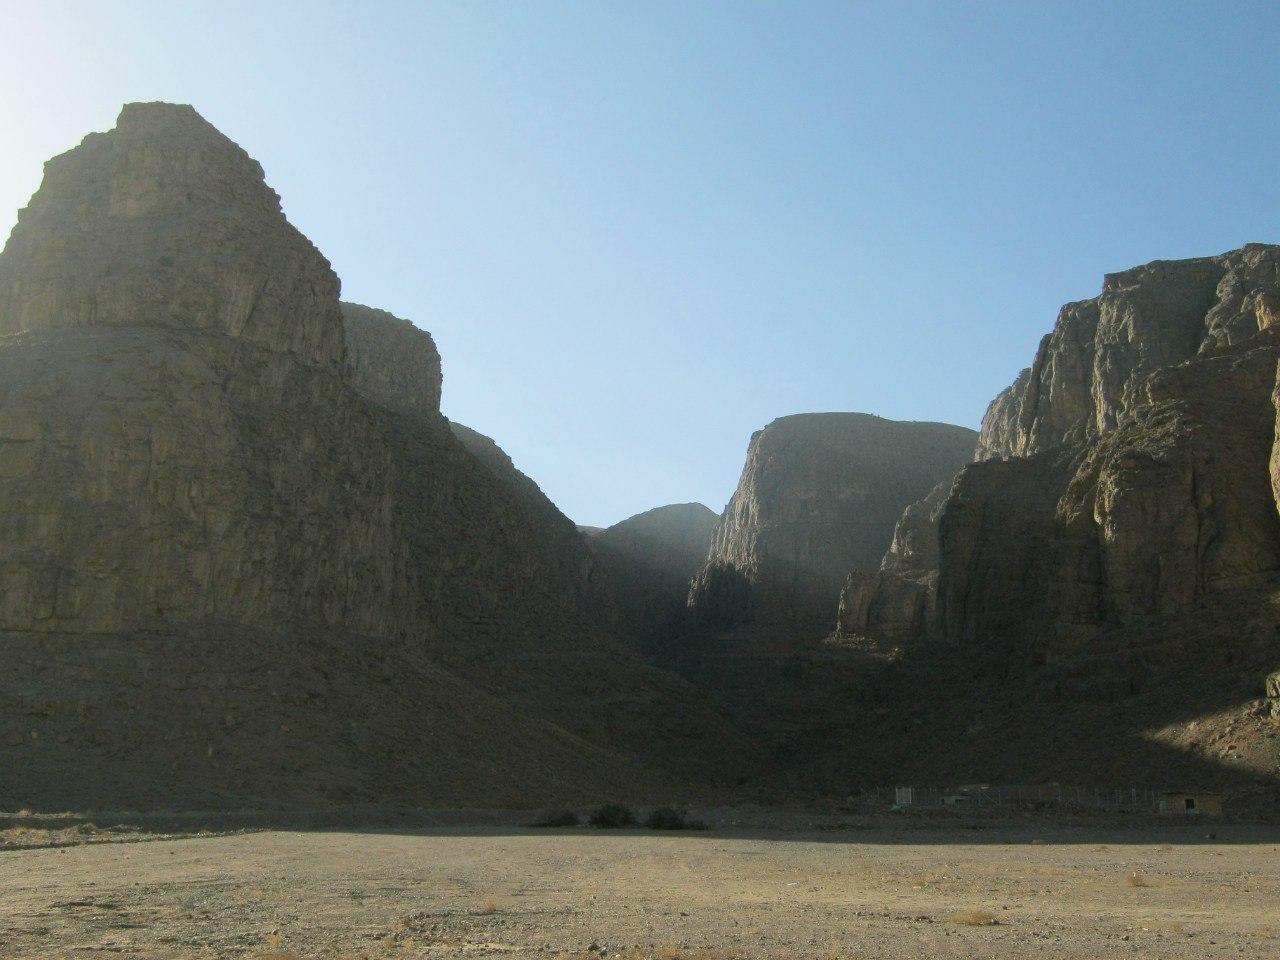 mountains nearby Qazd city